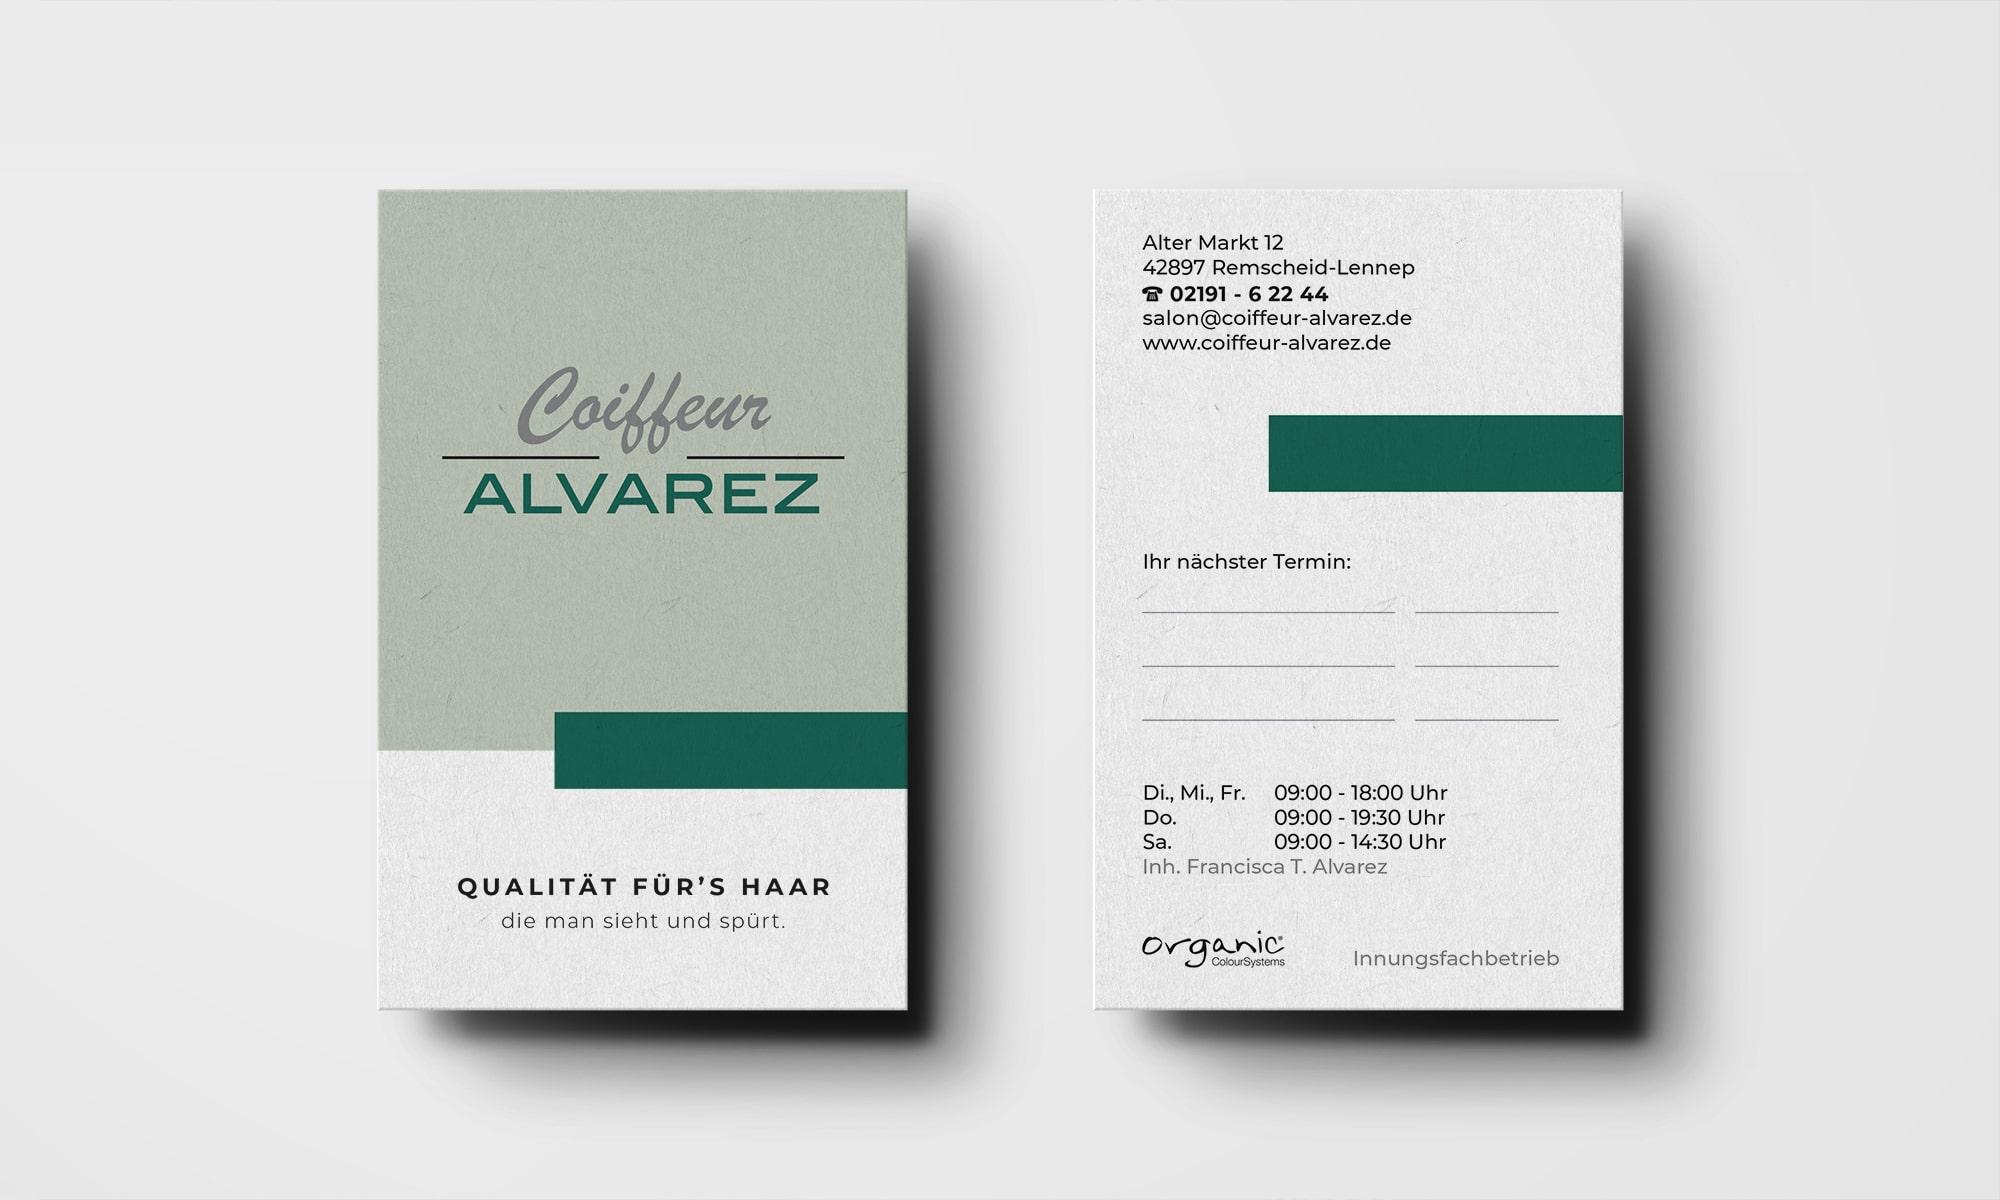 Coiffeur Alvarez Remscheid Visitenkarte